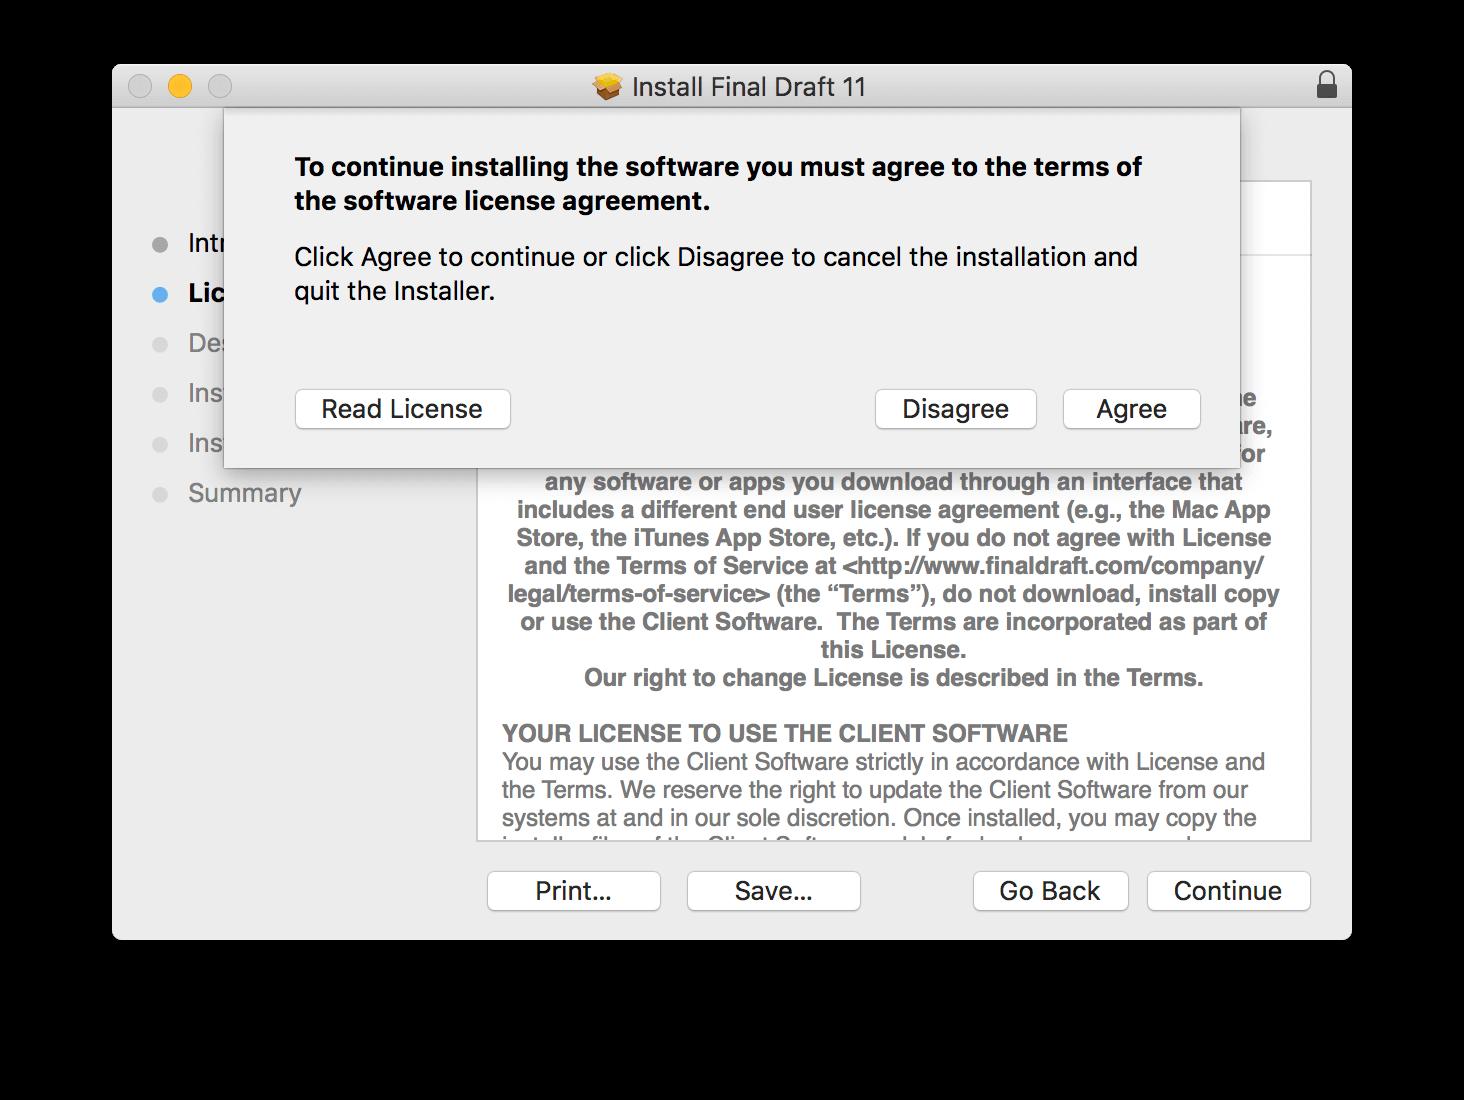 Install Final Draft 11 | Macintosh | Final Draft®